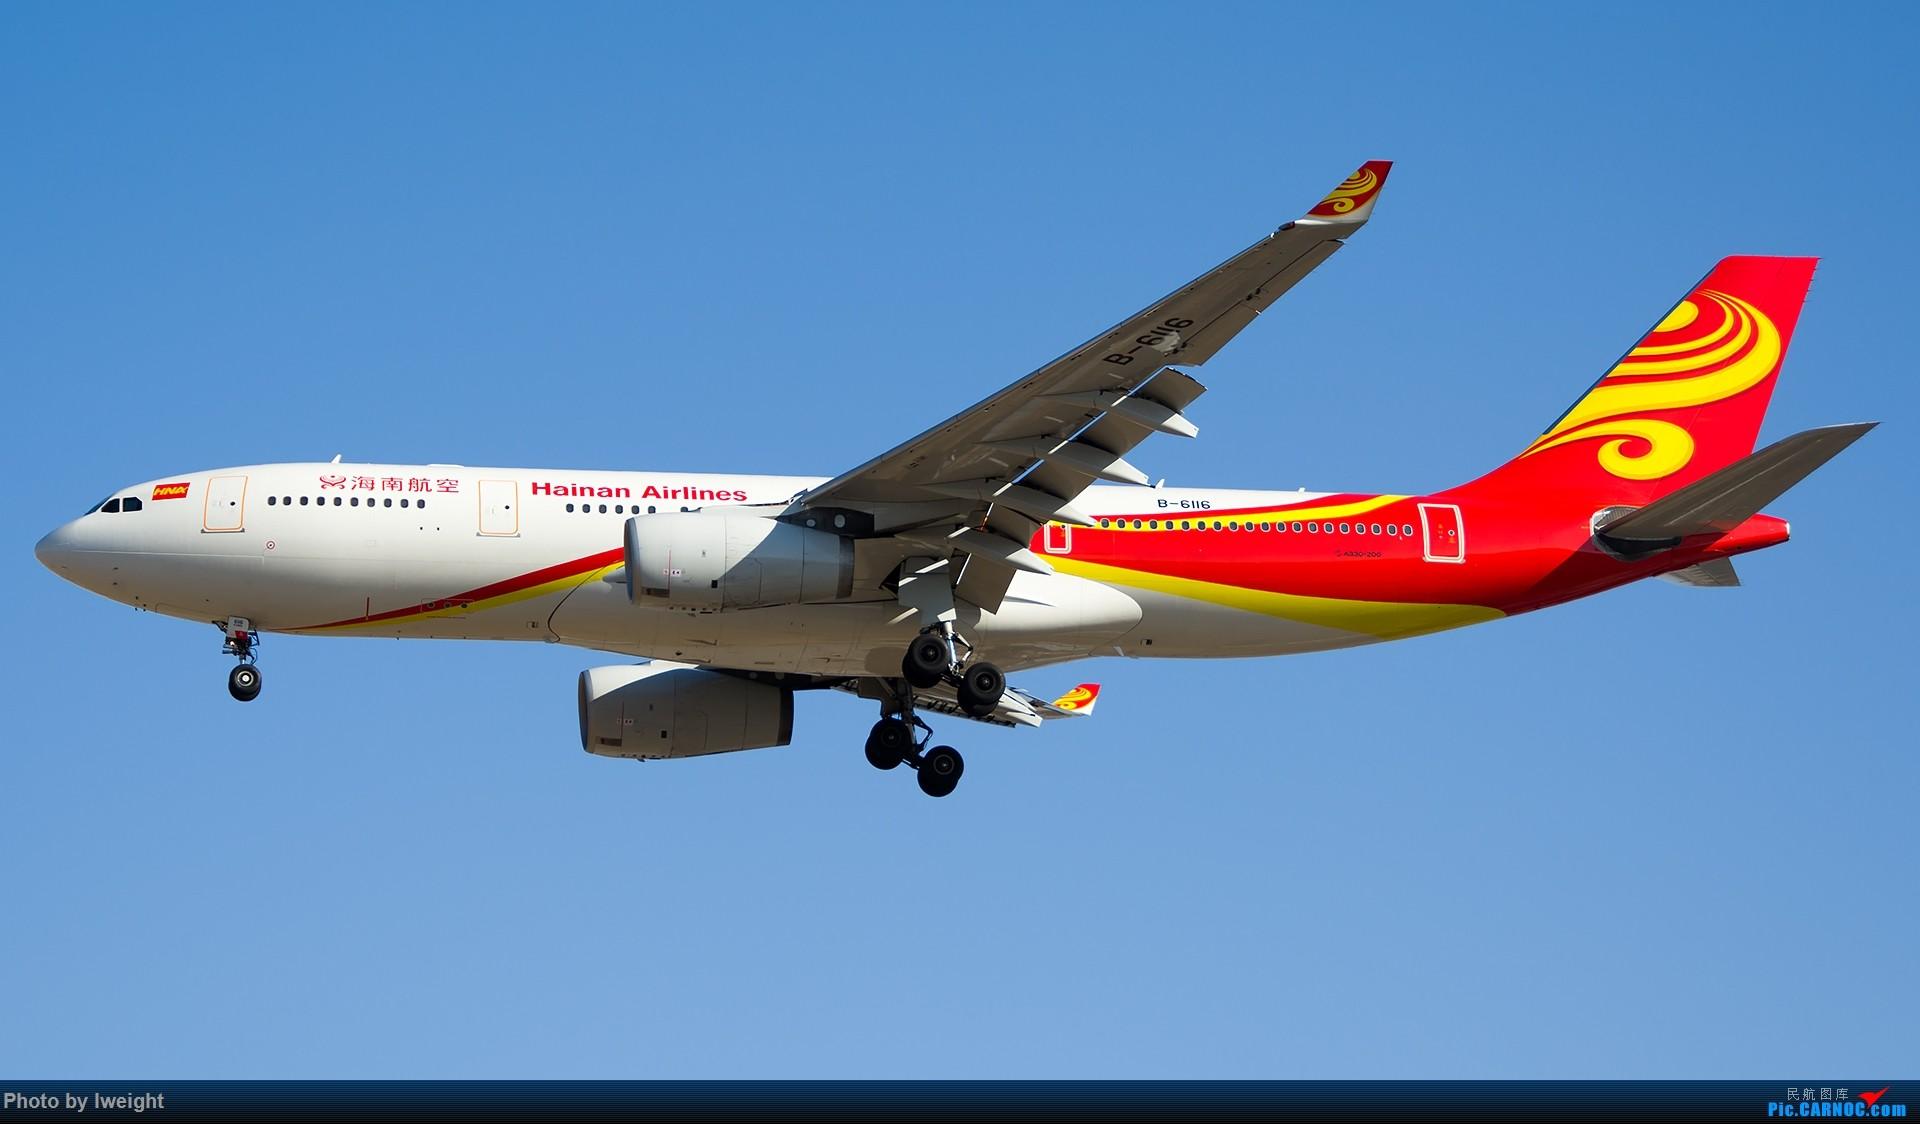 Re:[原创]北京难得的好天气,随手拍了一些渣图【2015-01-27】 AIRBUS A330-200 B-6116 中国北京首都国际机场